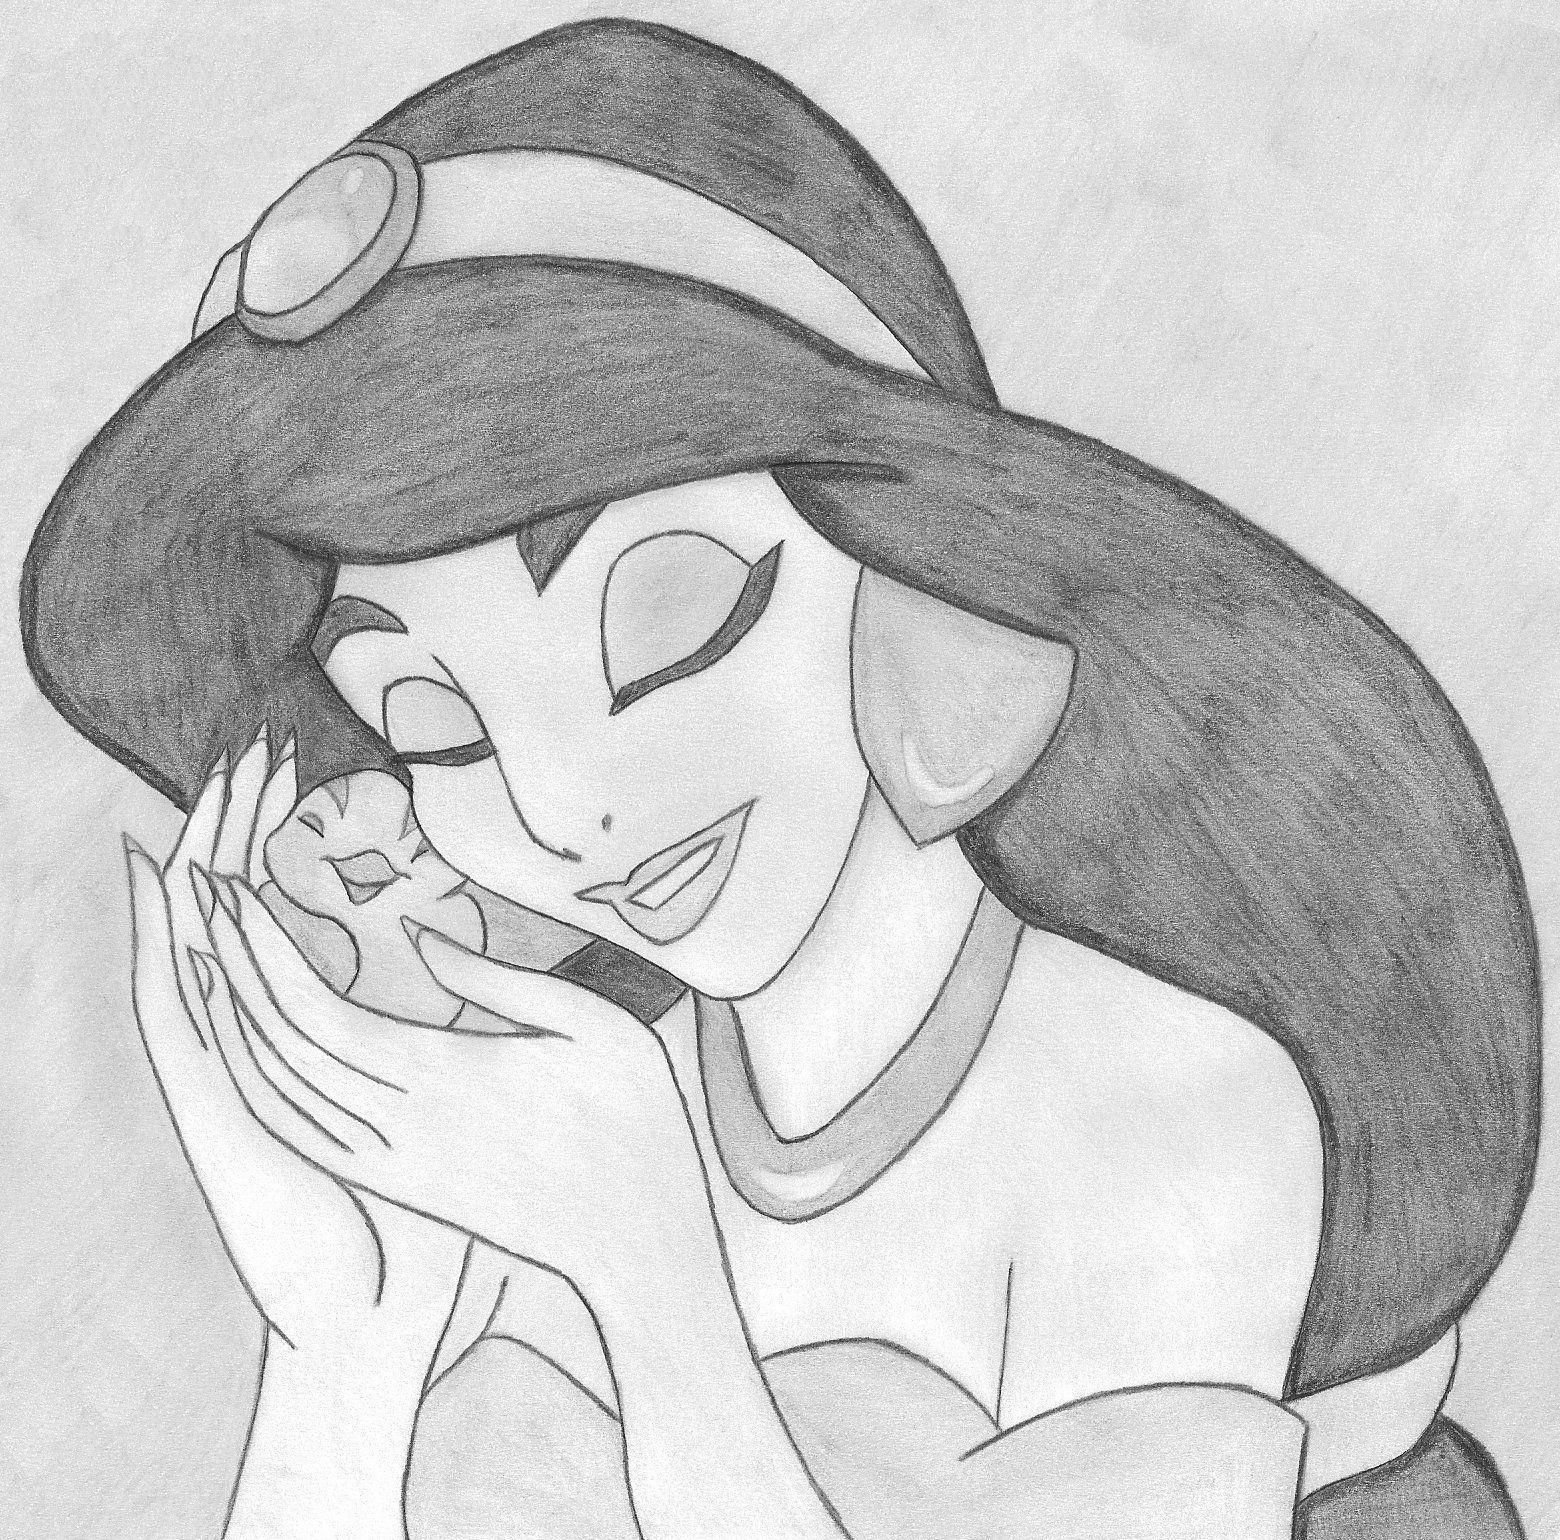 Jasmine loves birds by lordsnoopy on DeviantArt